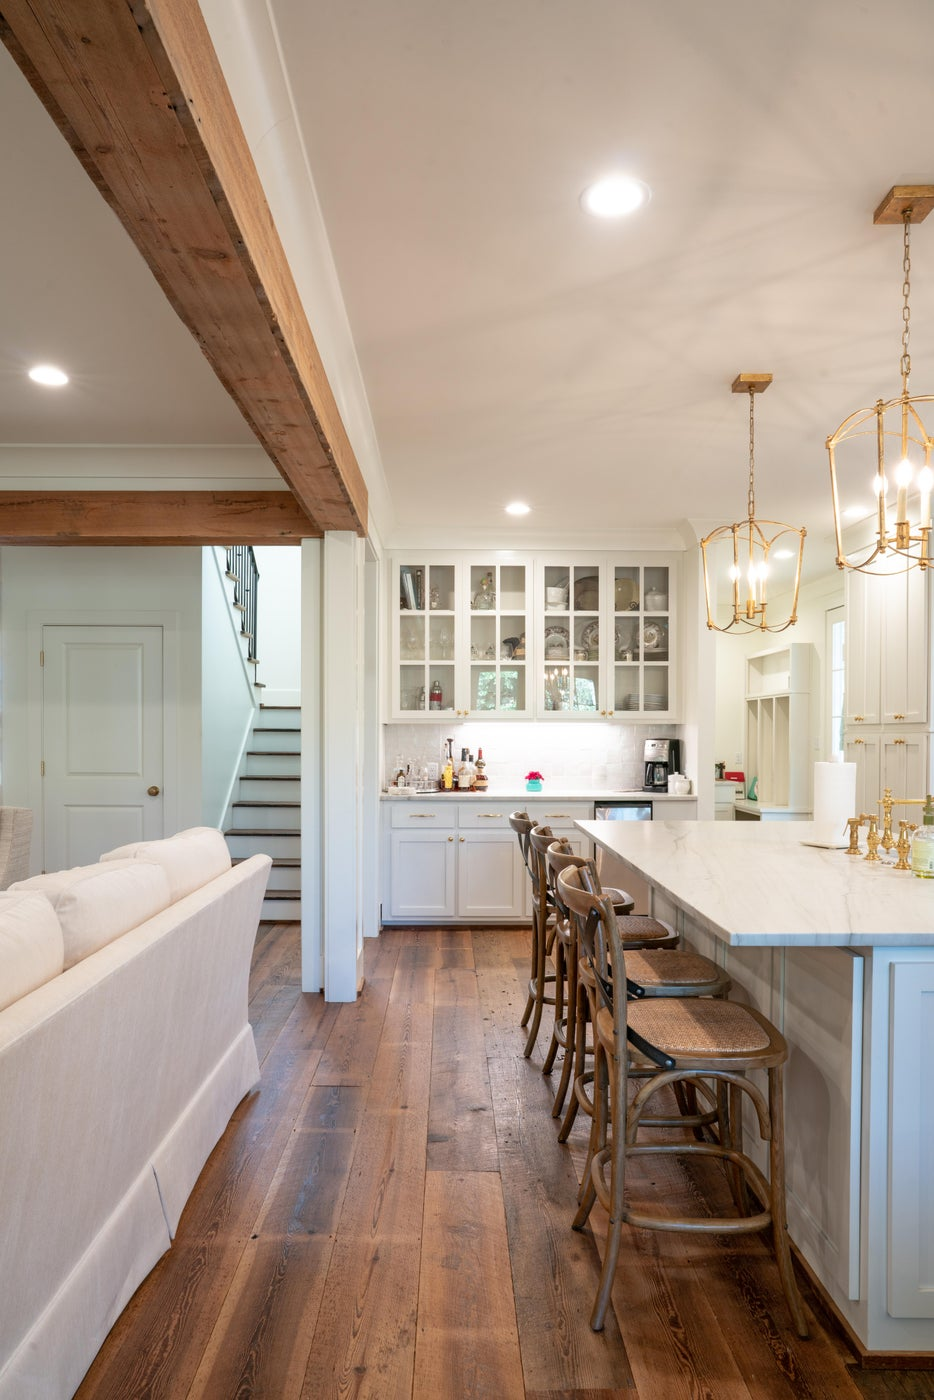 Private Residence. Wide Plank, Saw Kerf Pine Flooring. Reclaimed Pine Beams.